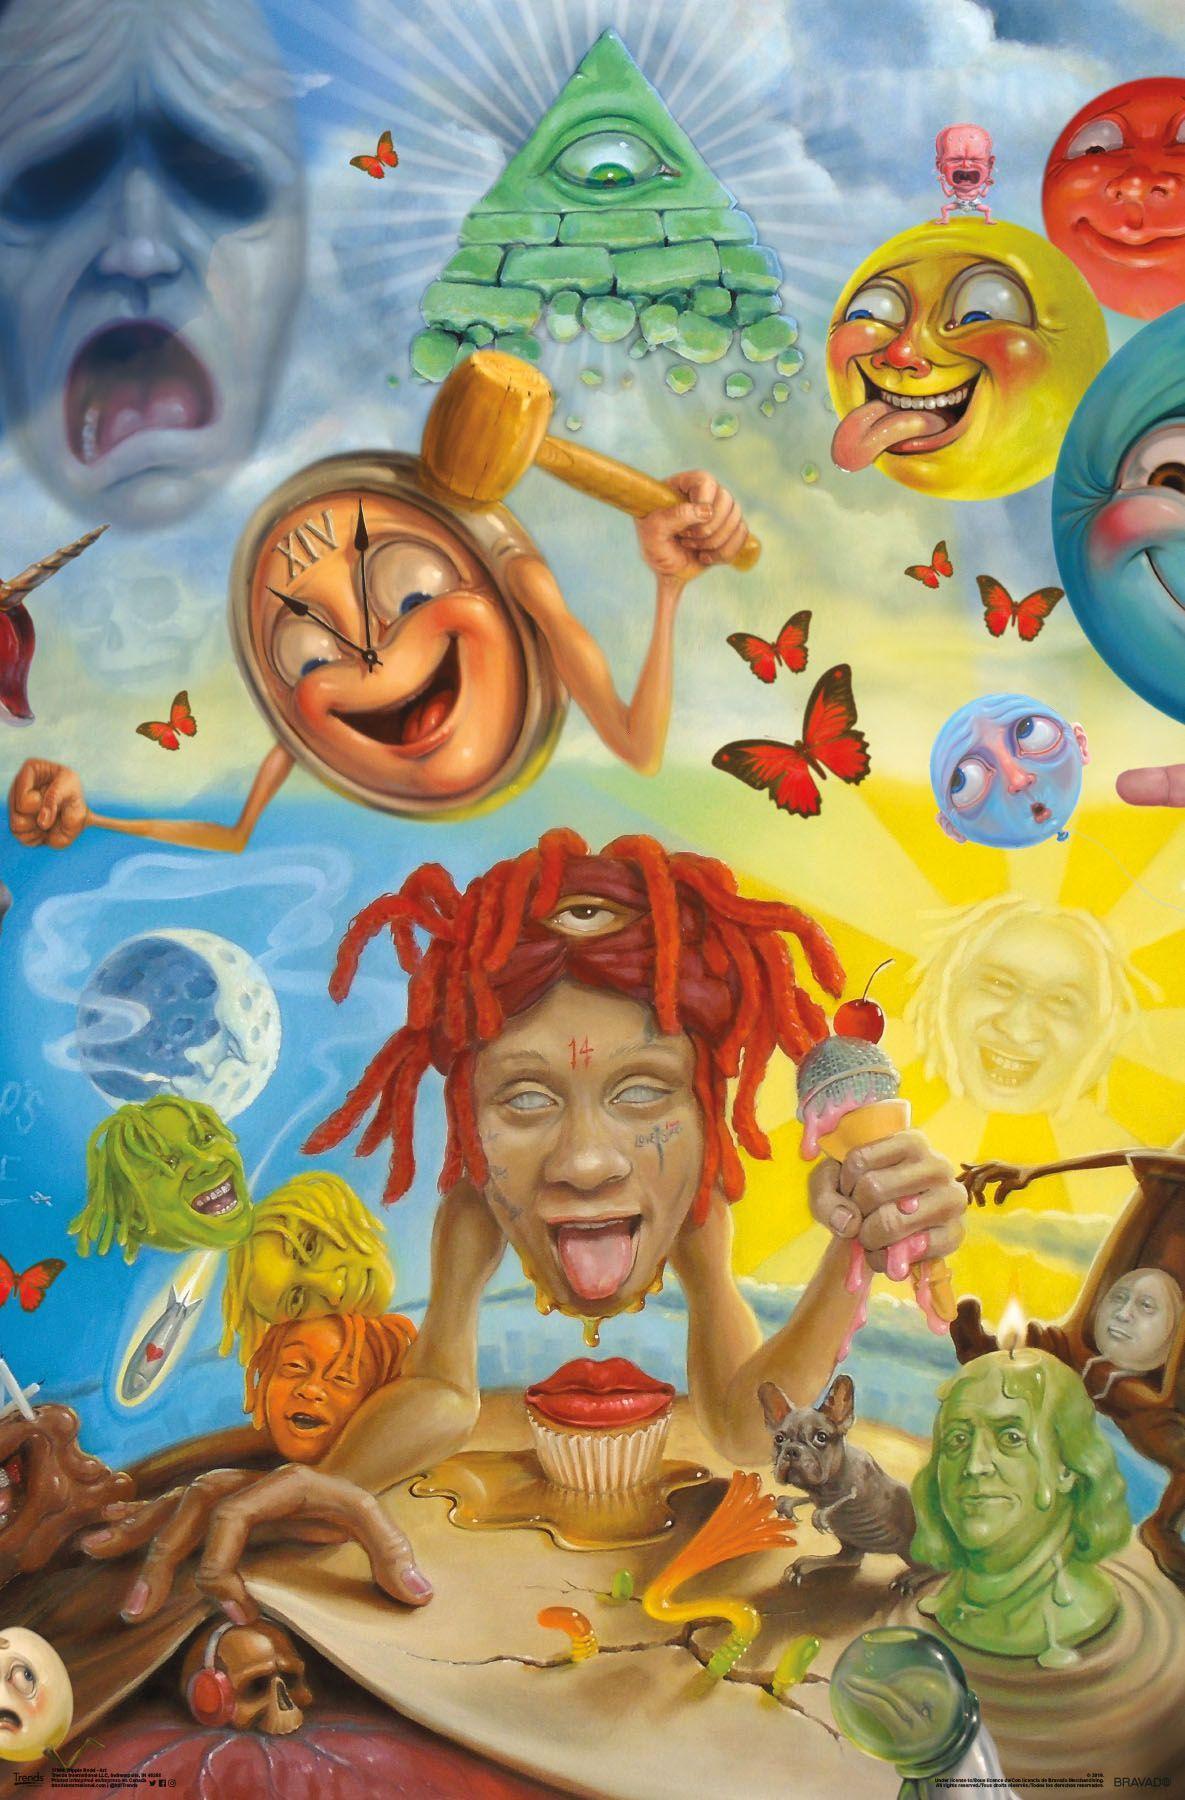 Trippie Redd - Art - Walmart.com